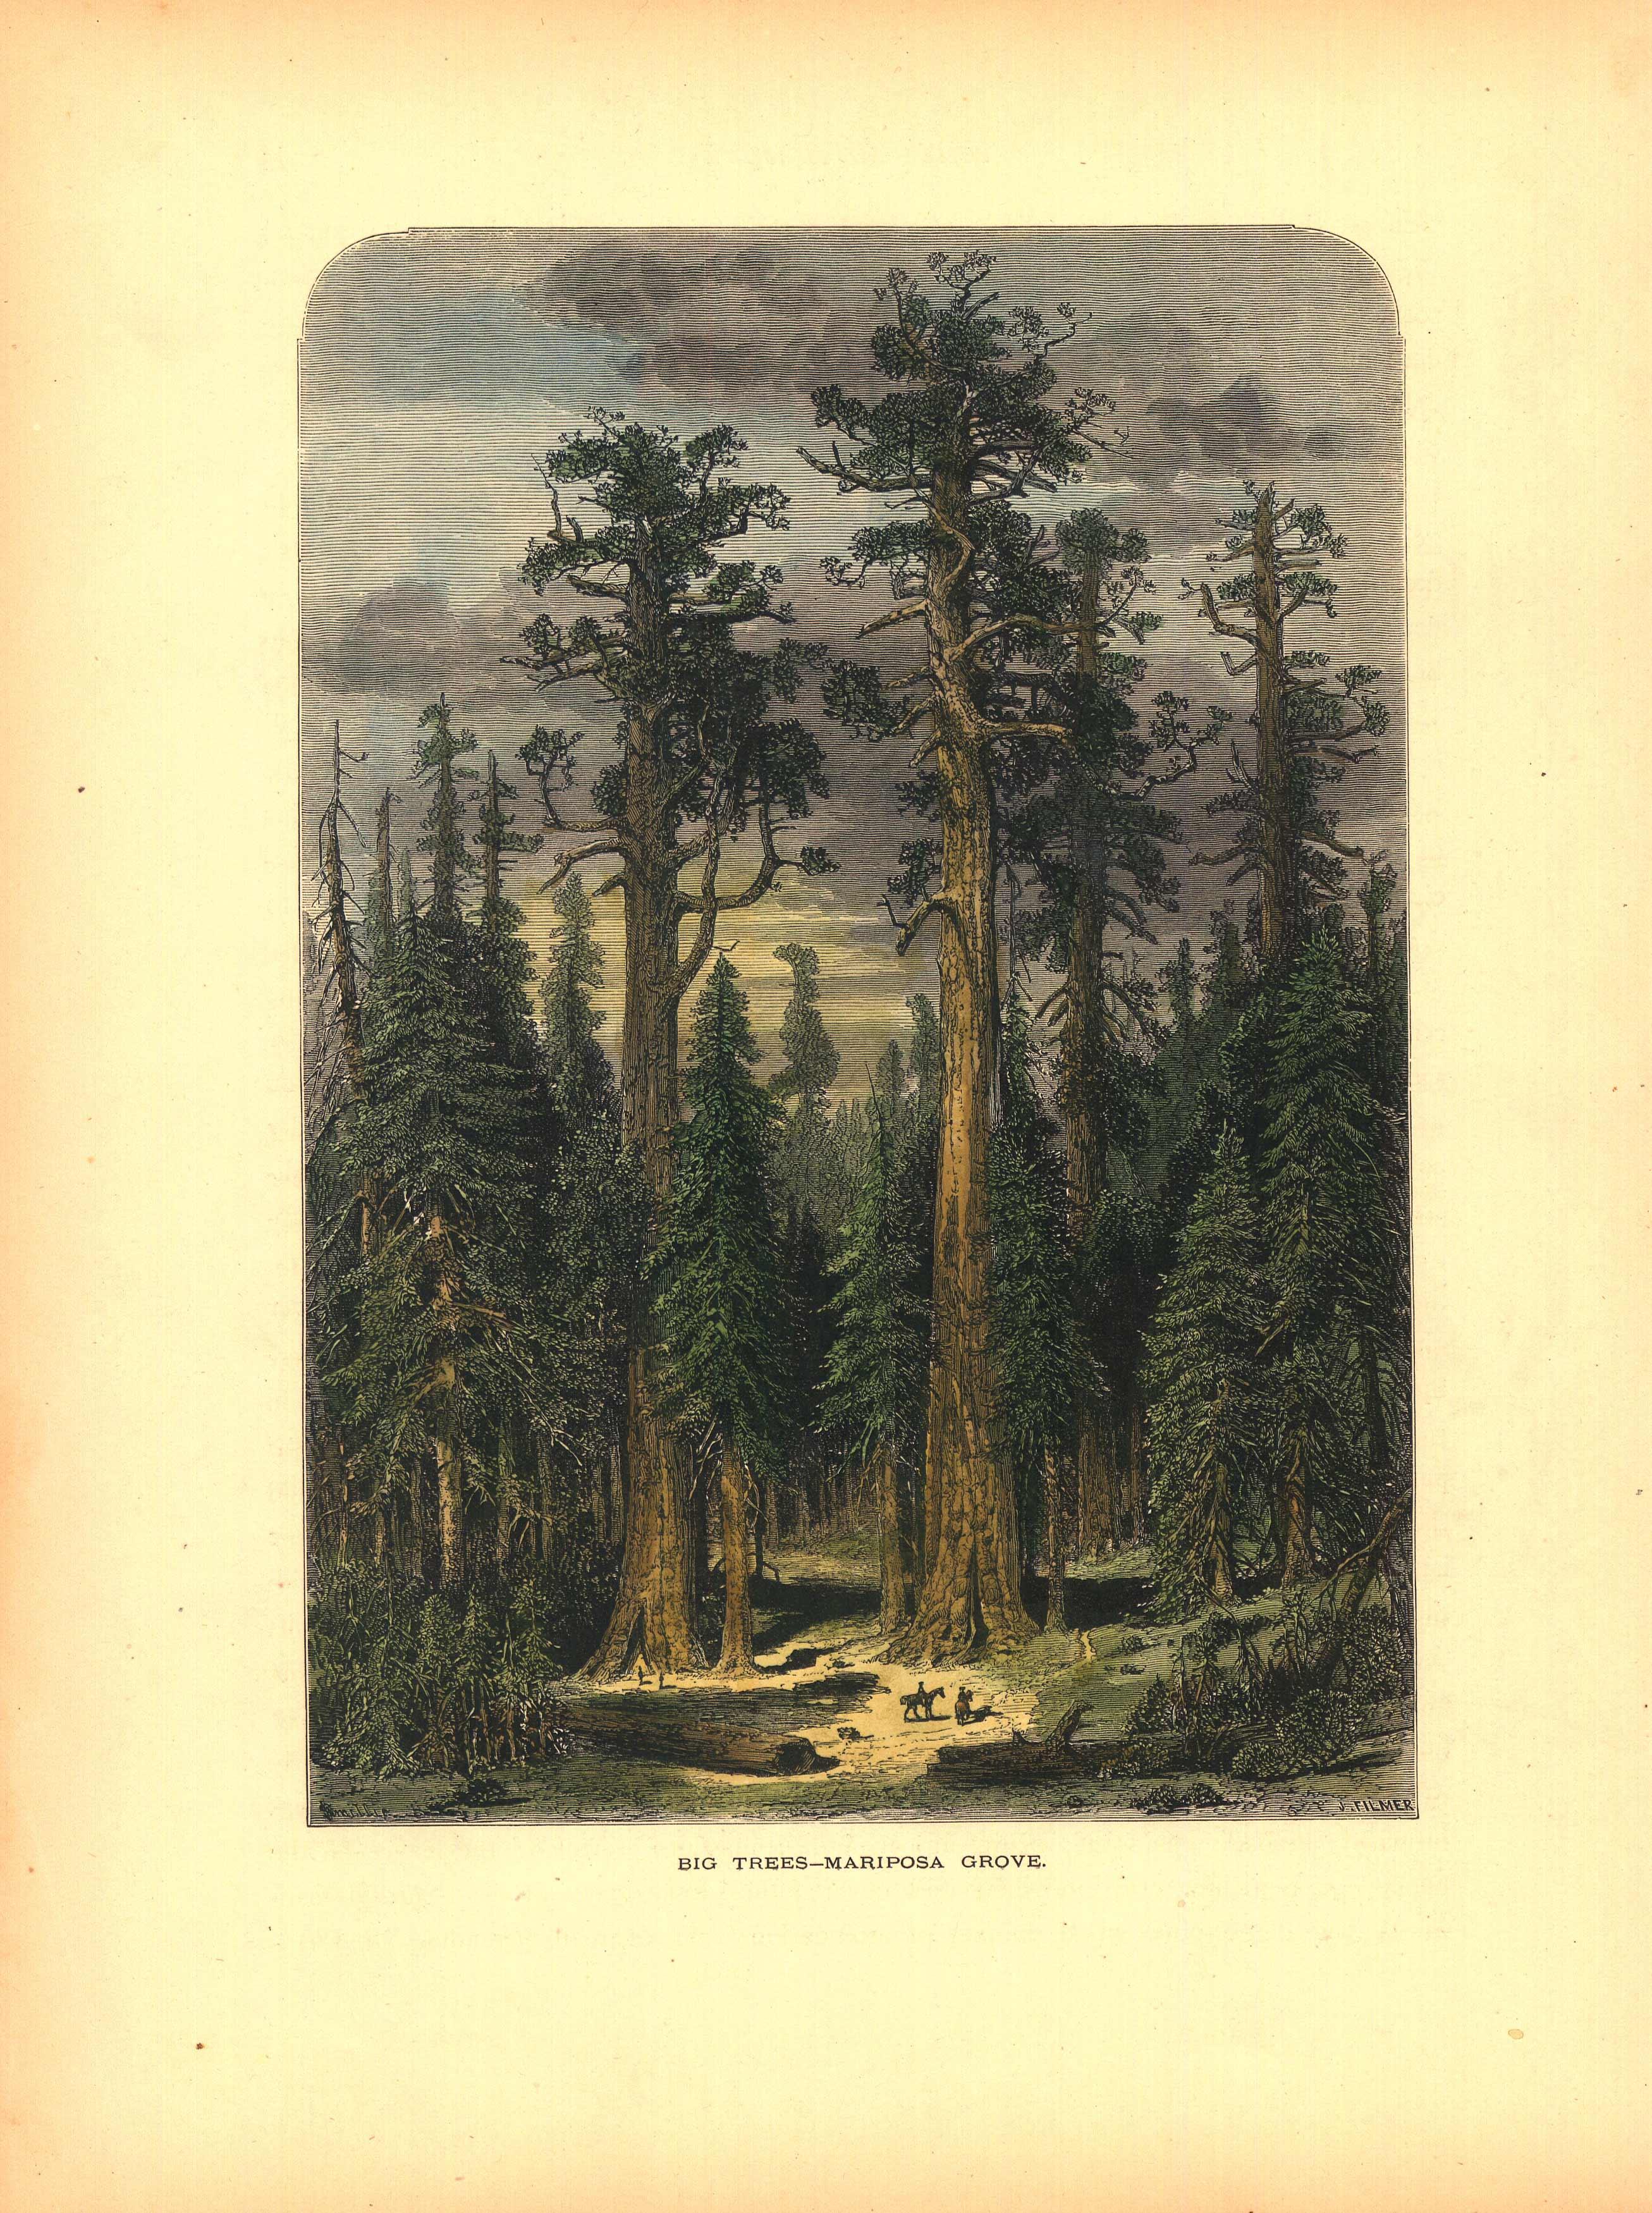 Big Trees - Mariposa Grove